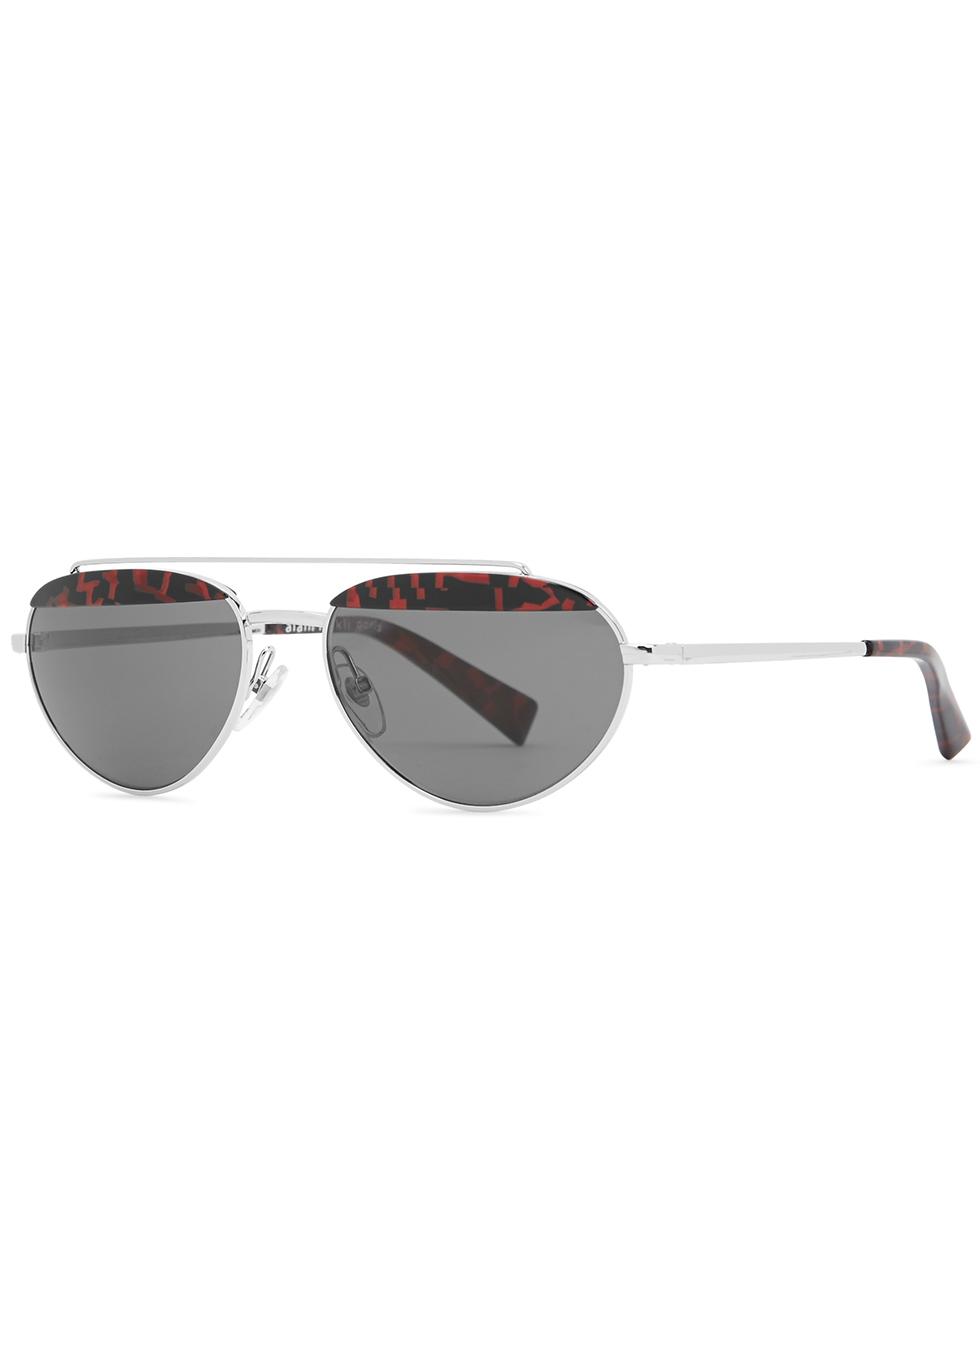 Elicot oval-frame sunglasses - ALAIN MIKLI